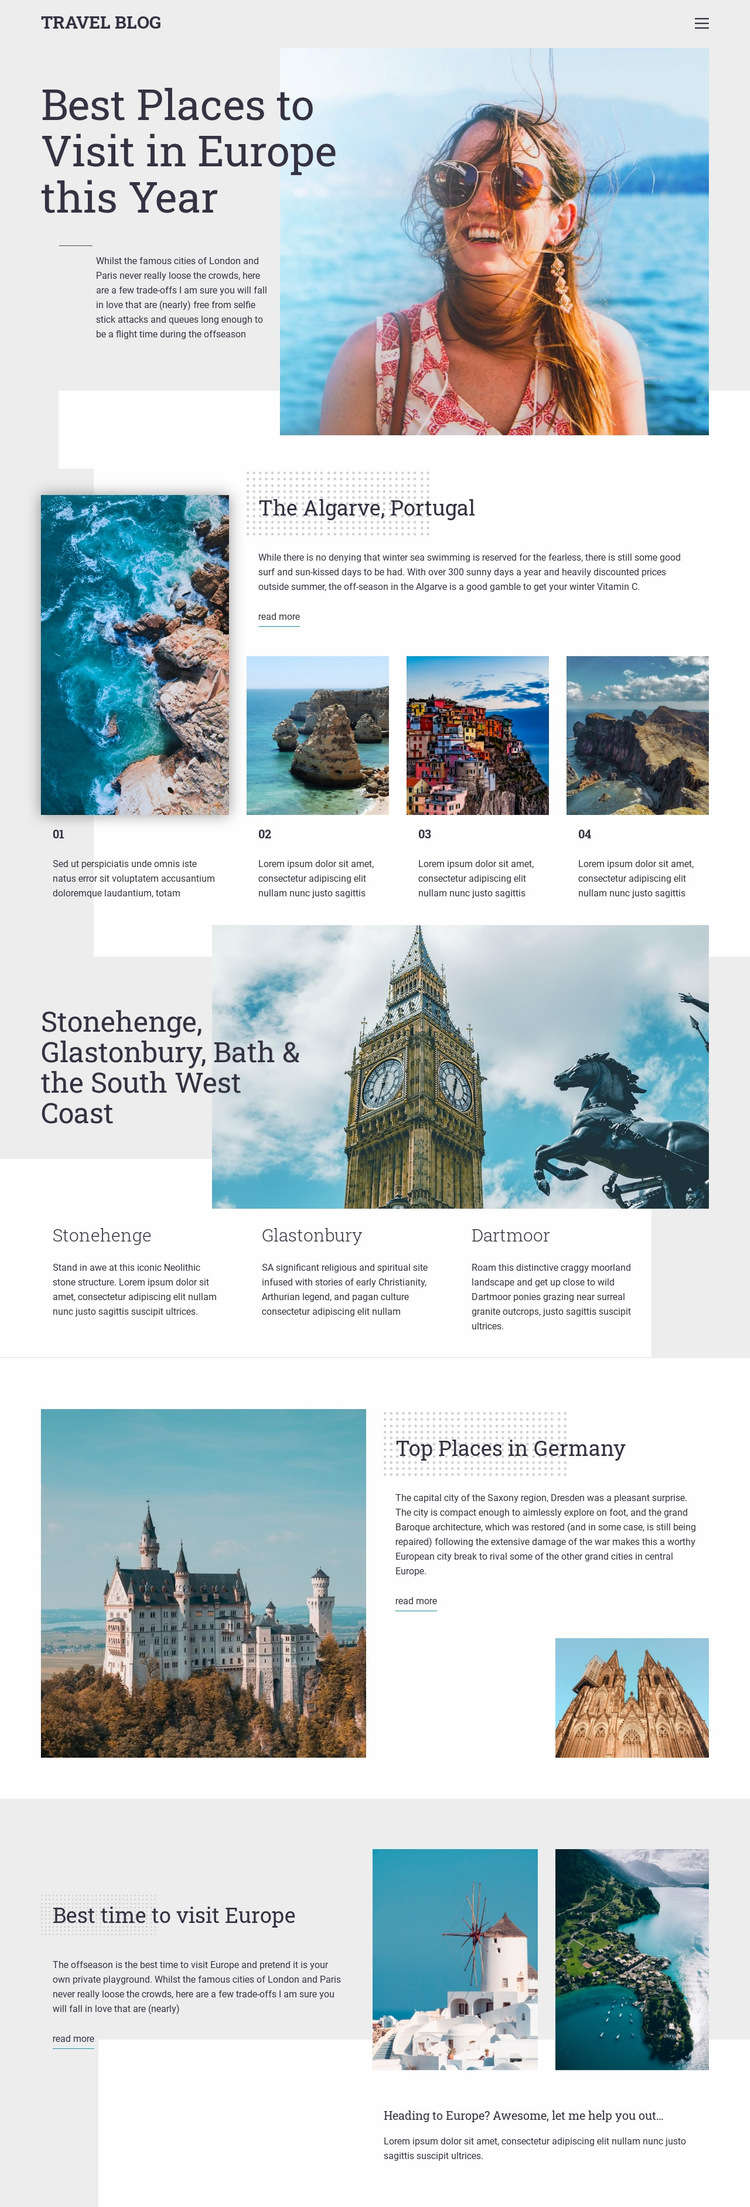 Travel Blog Web Page Design